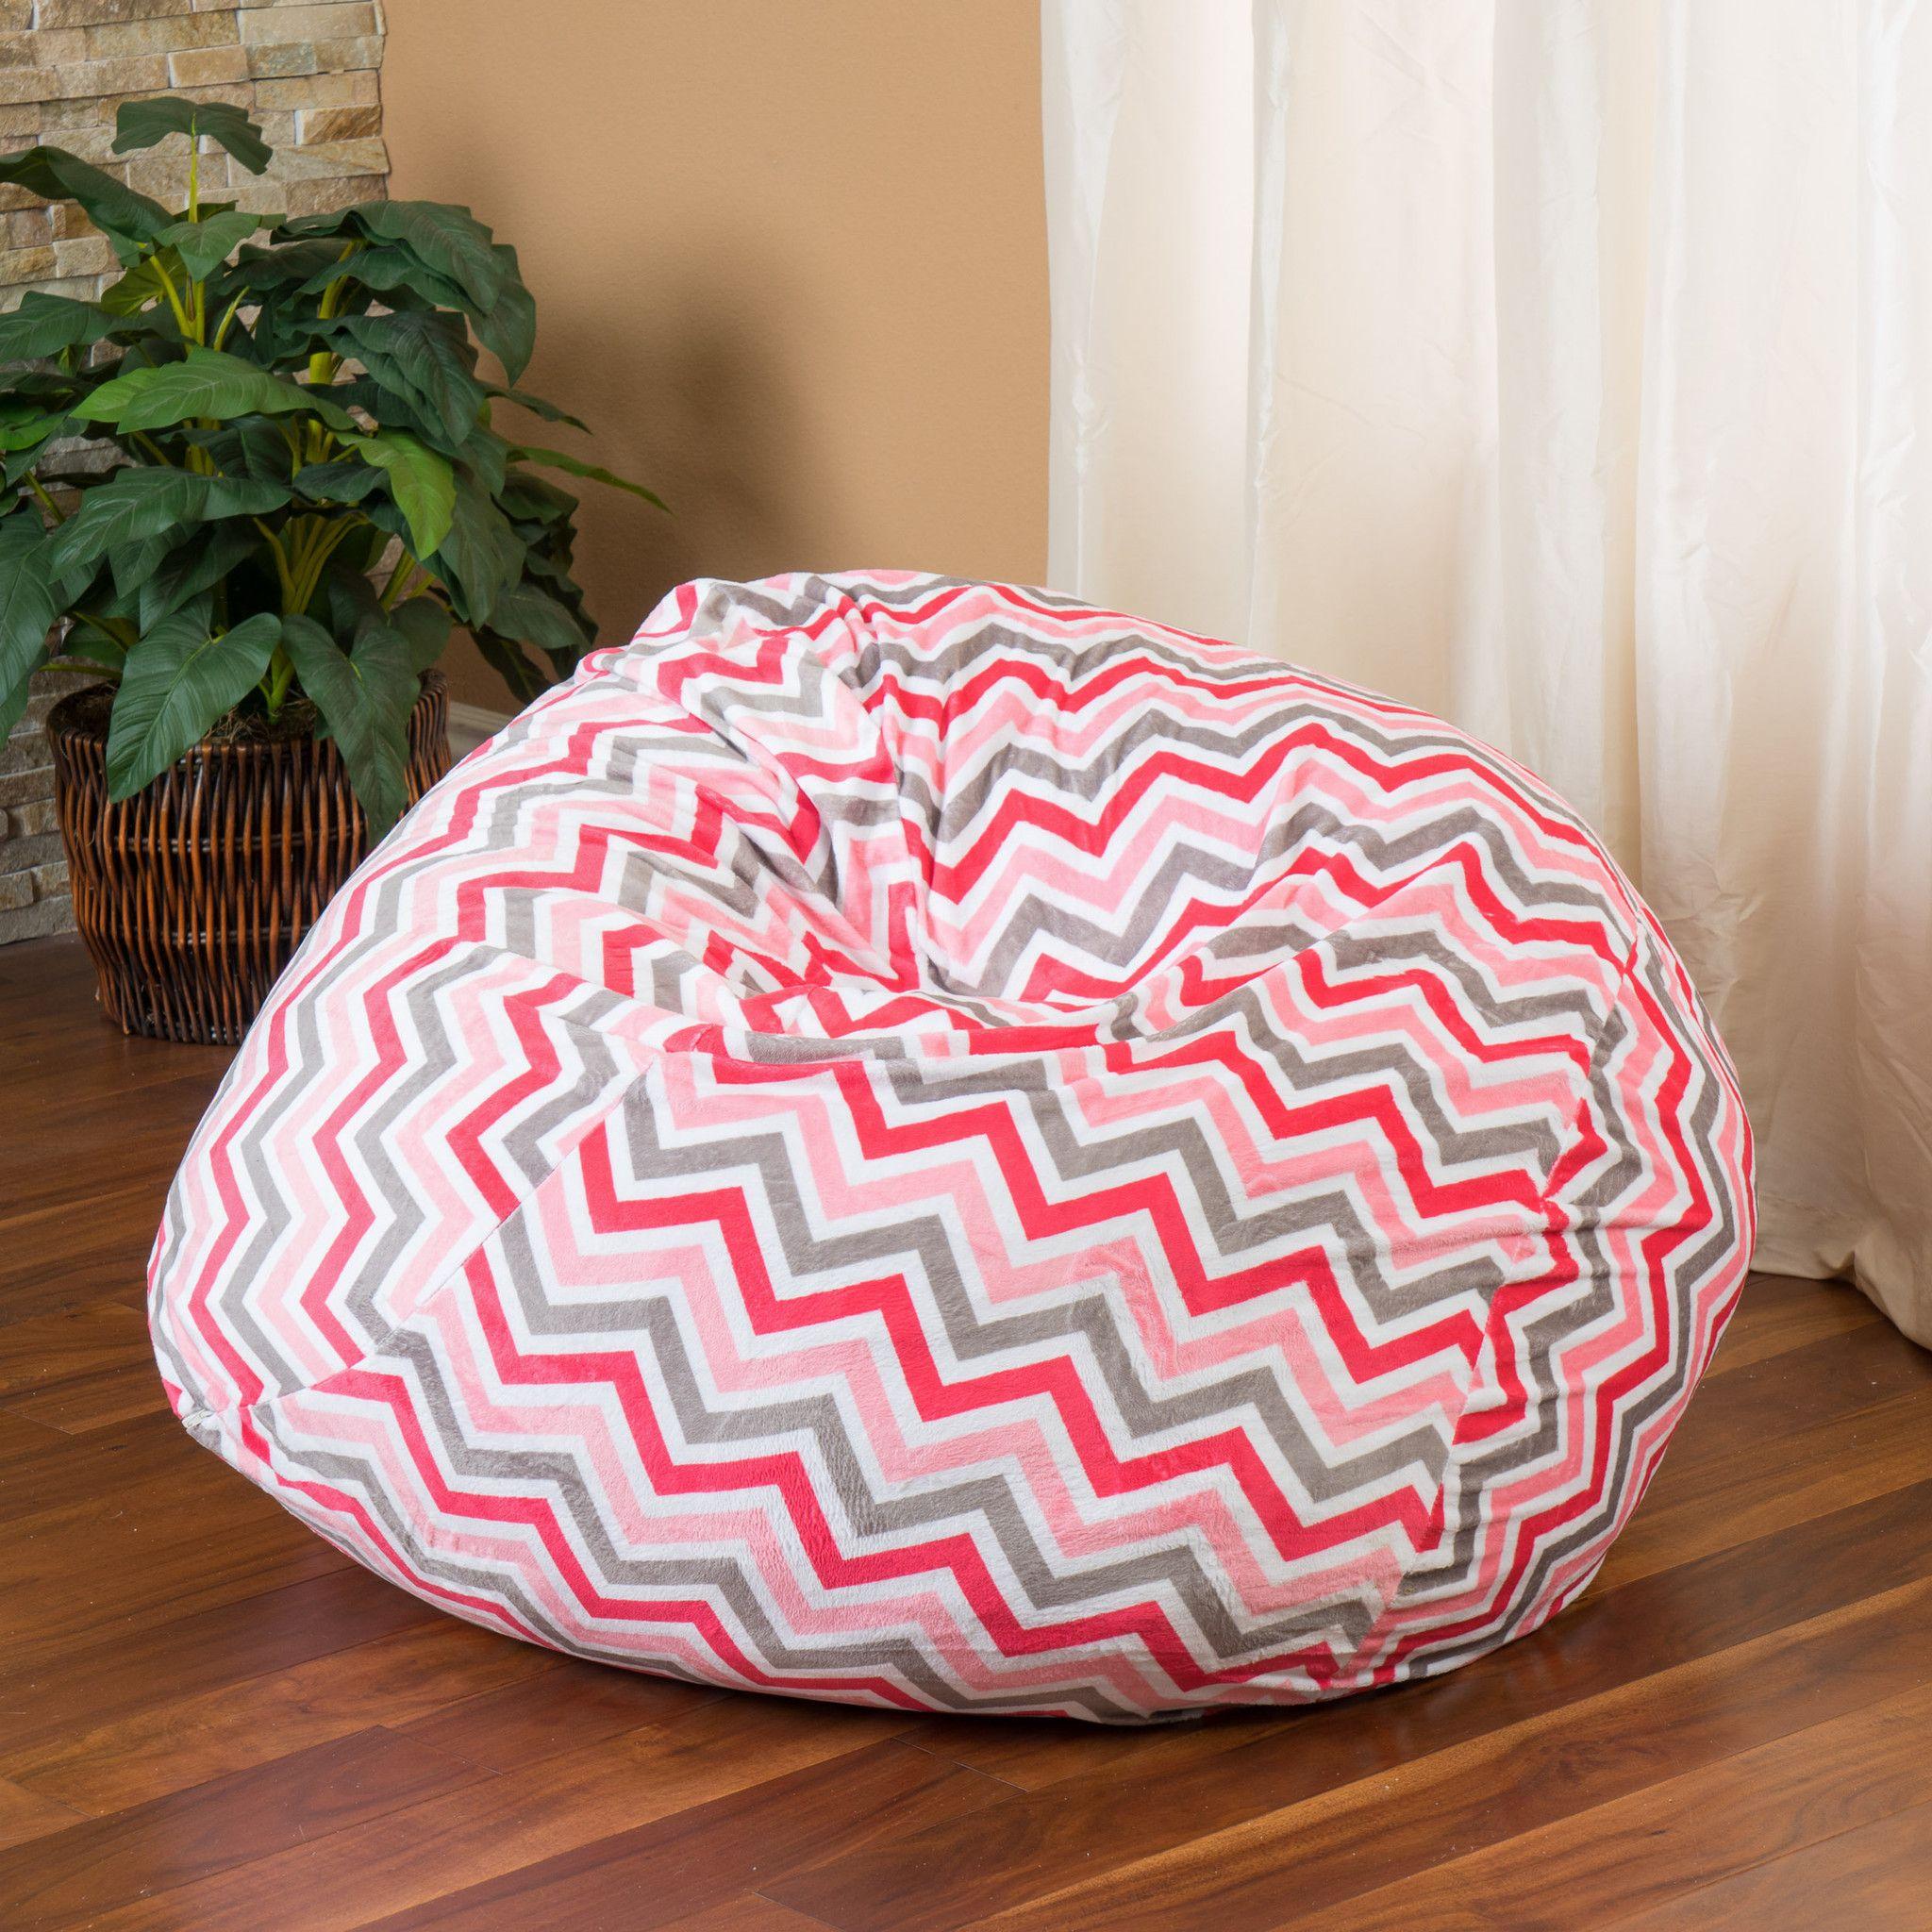 Ashley 3Ft Pink Charcoal Chevron Stripe Fabric Bean Bag Chair